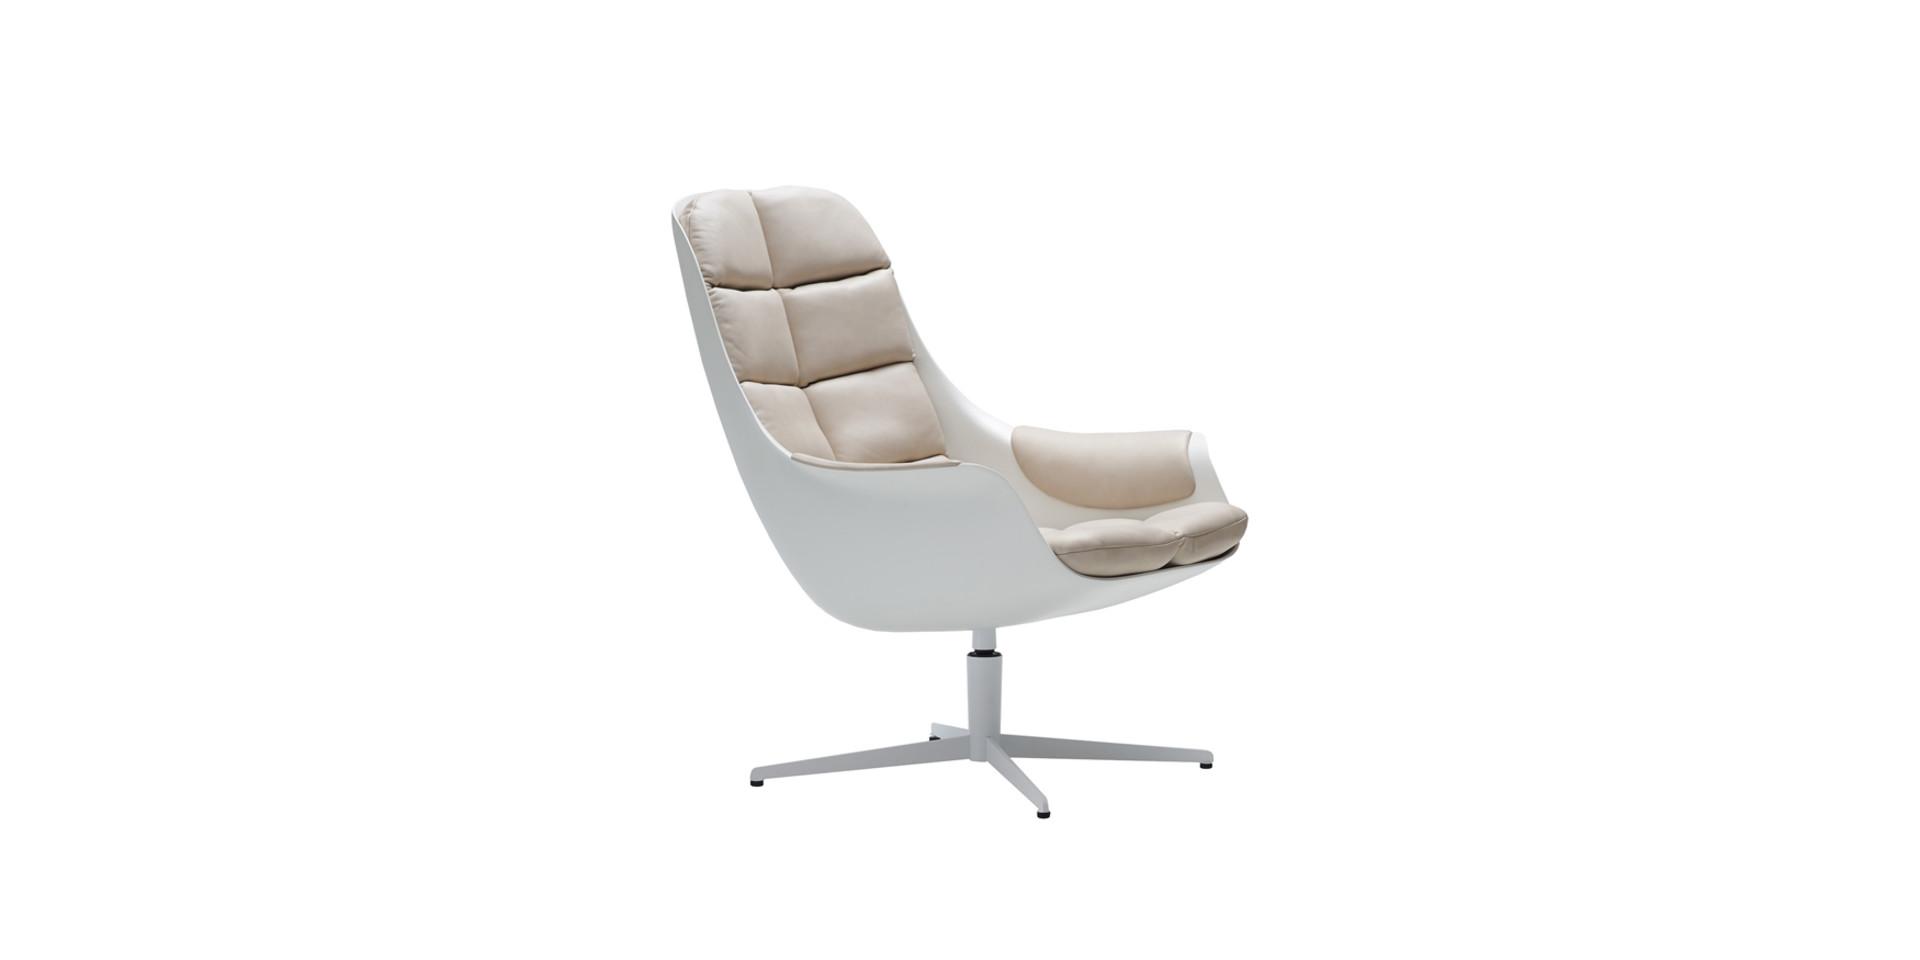 MYBIRD_armchair_swivel_white_aniline_nature_2